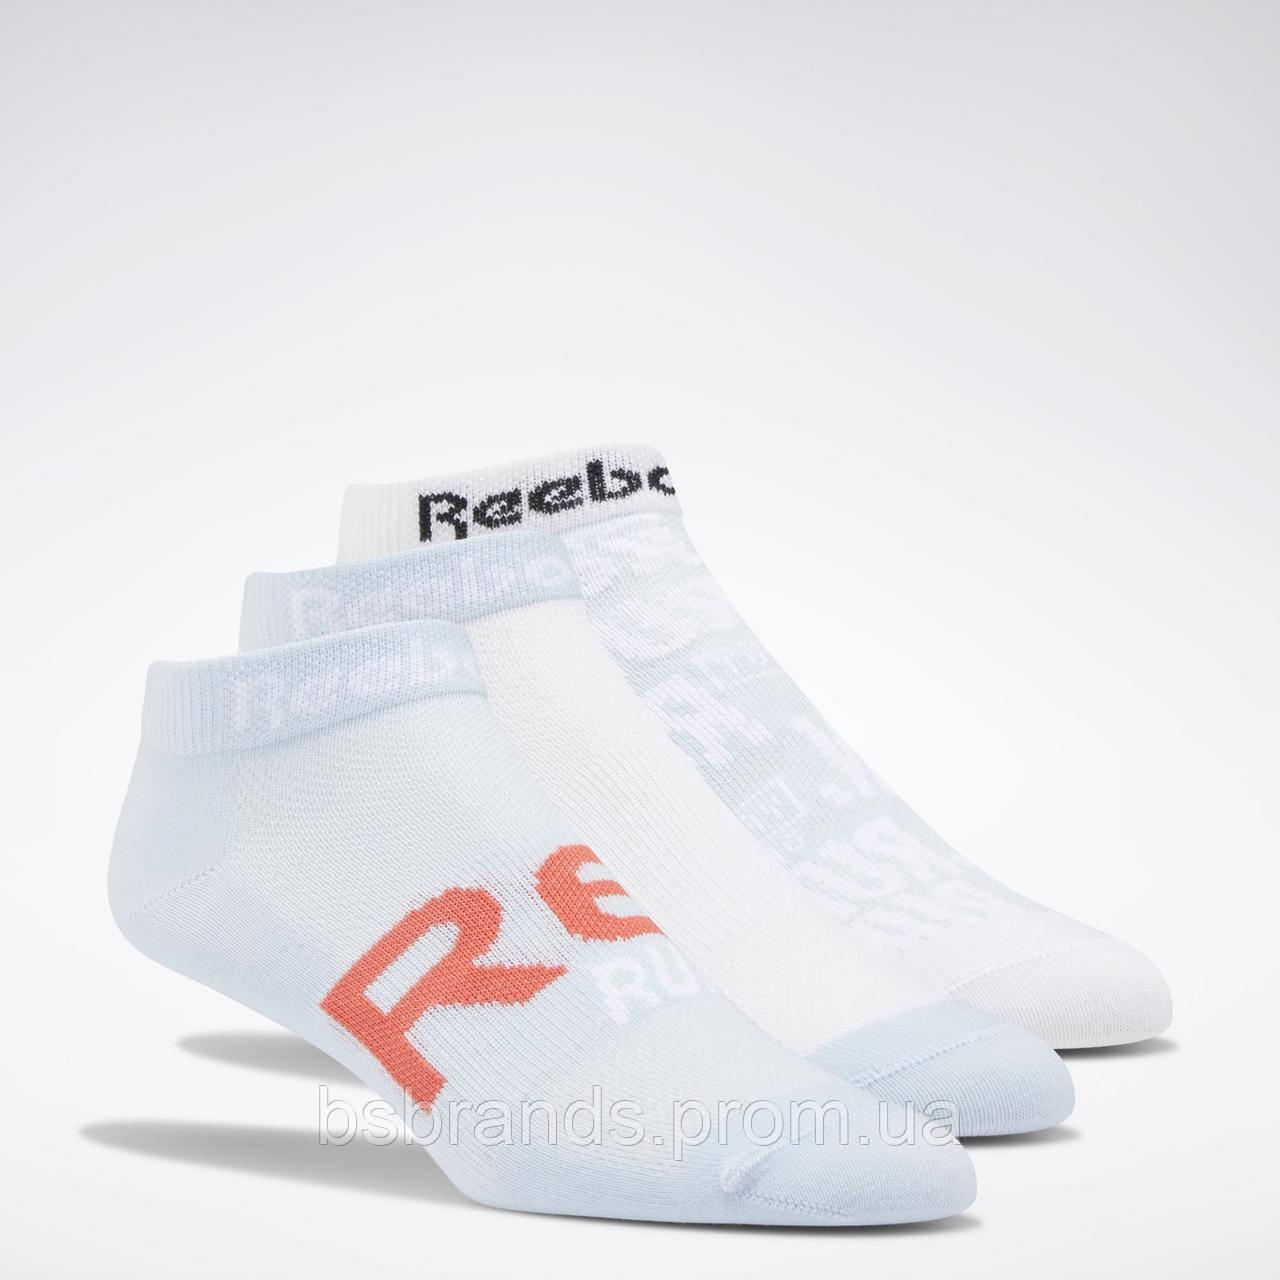 Спортивные носки Reebok Run Club, 3 пары FL5473 (2020/1)